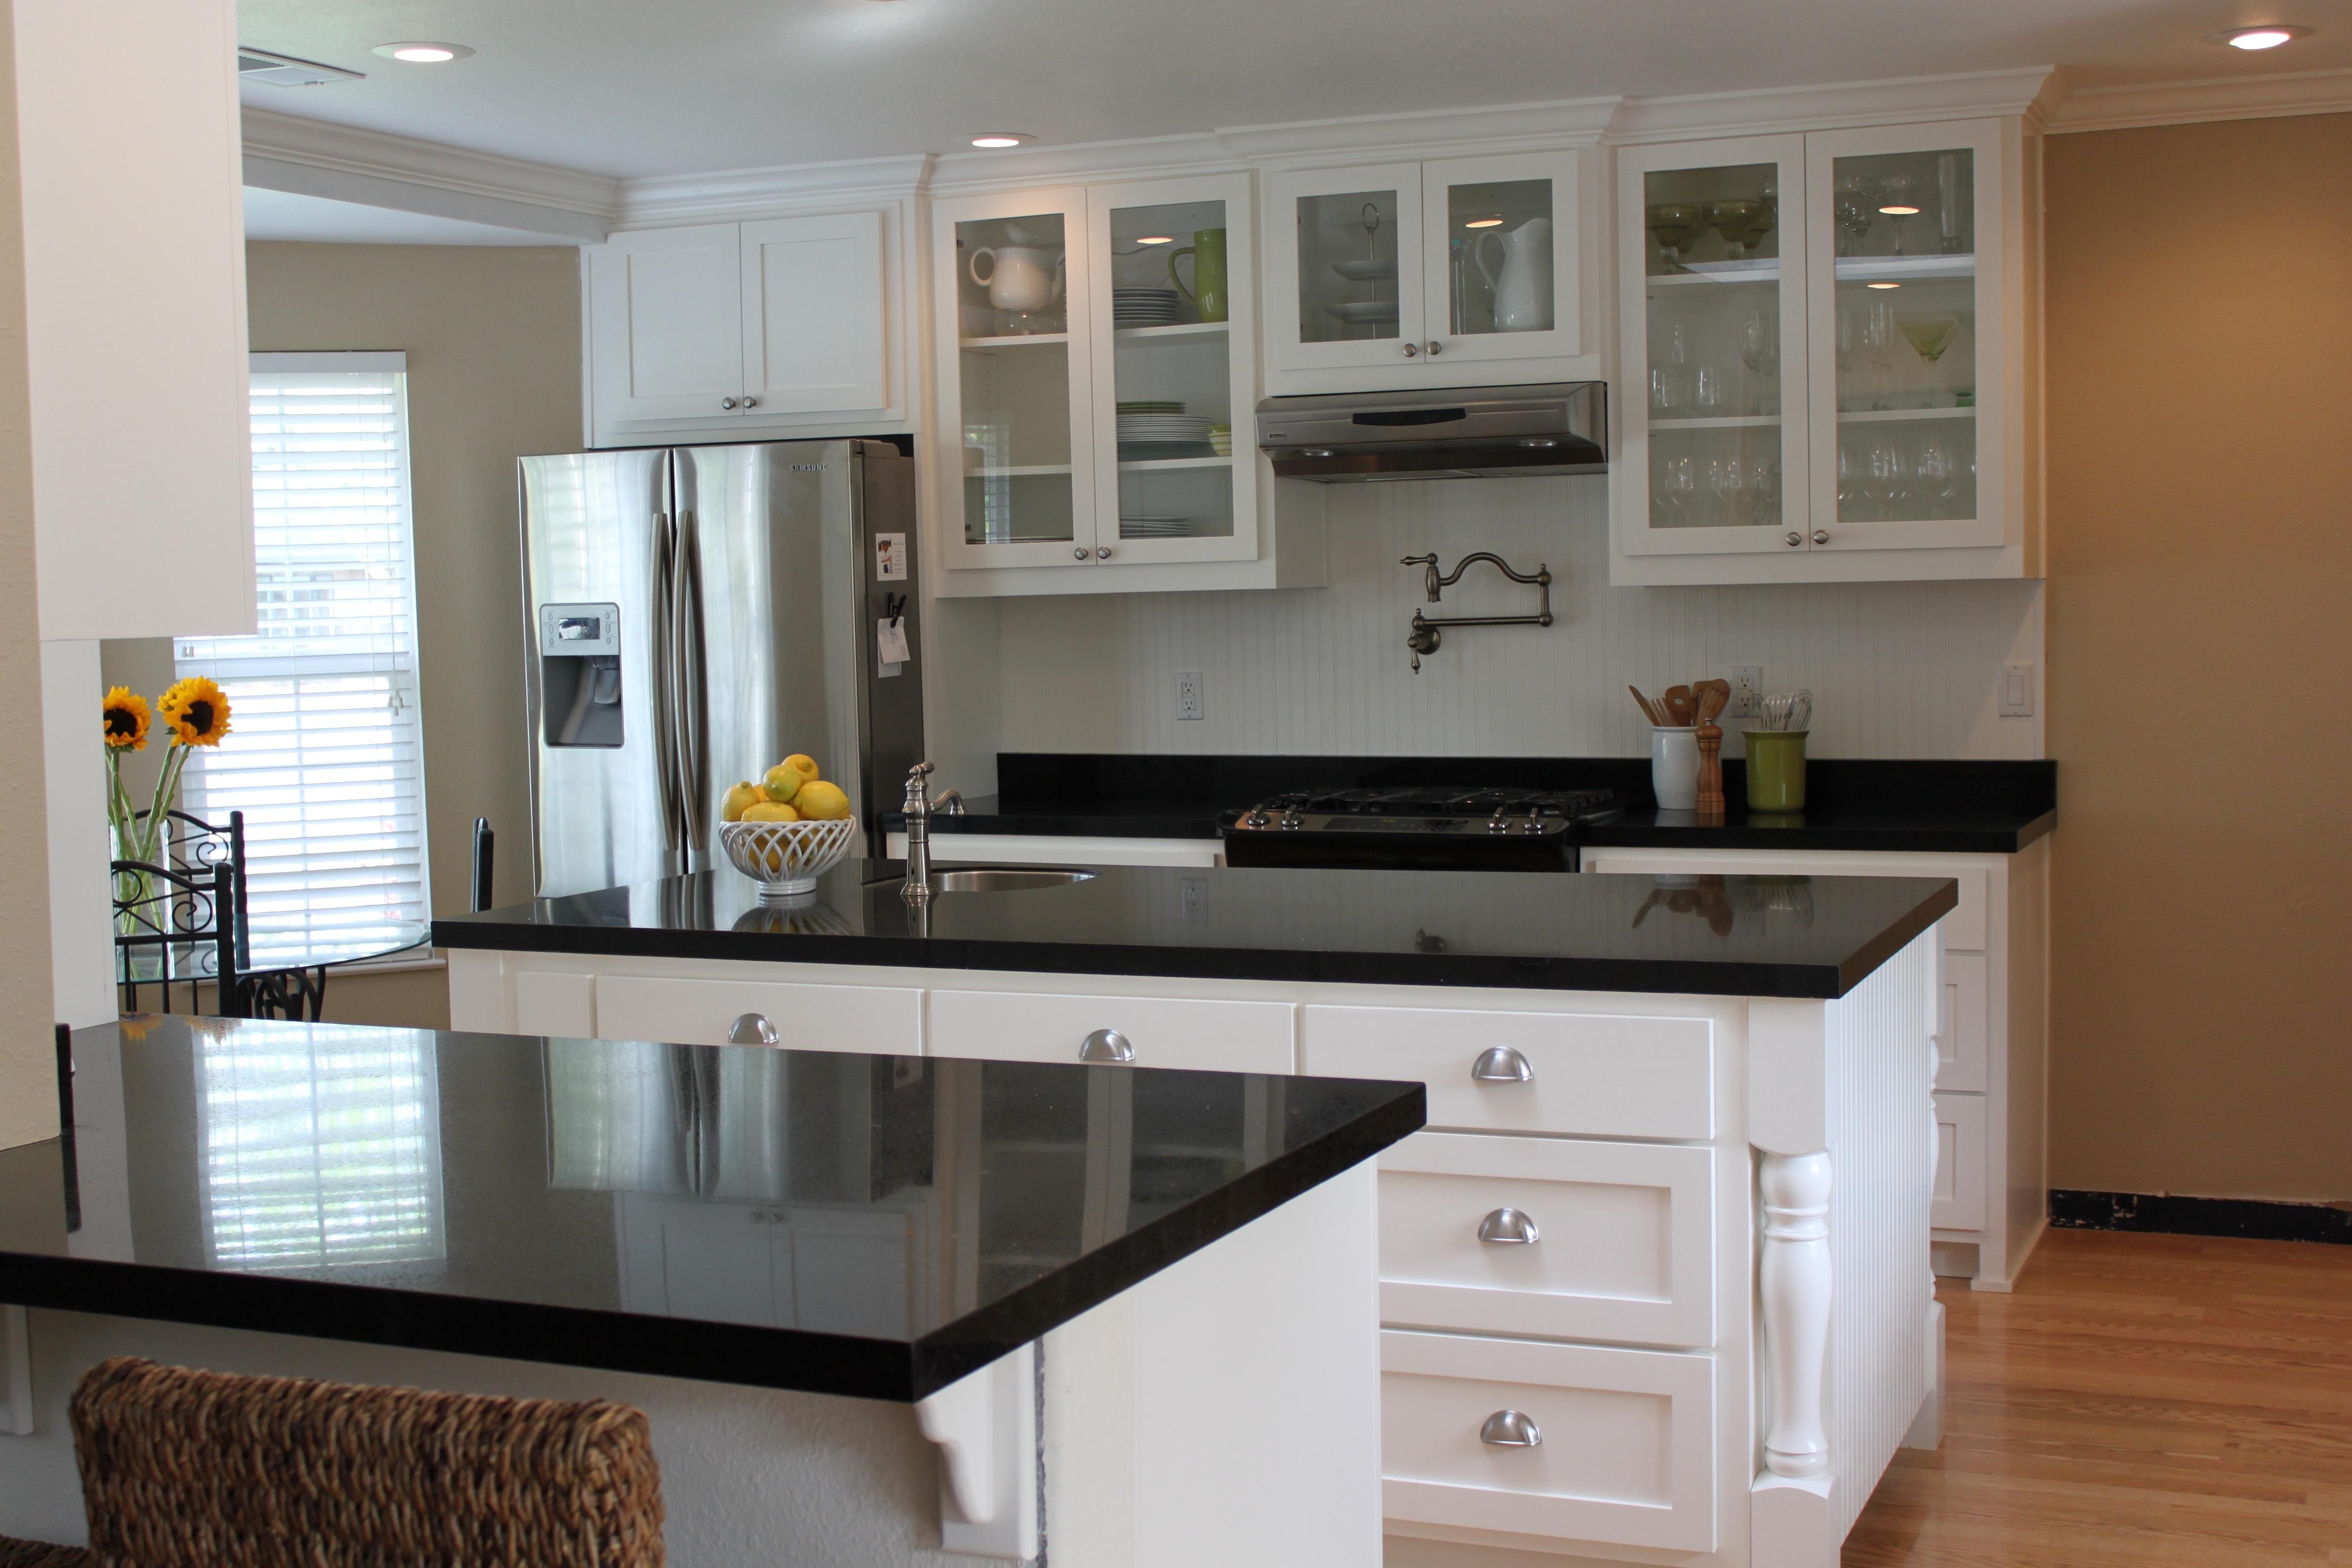 kitchen ideas white cabinets black countertop photo - 4